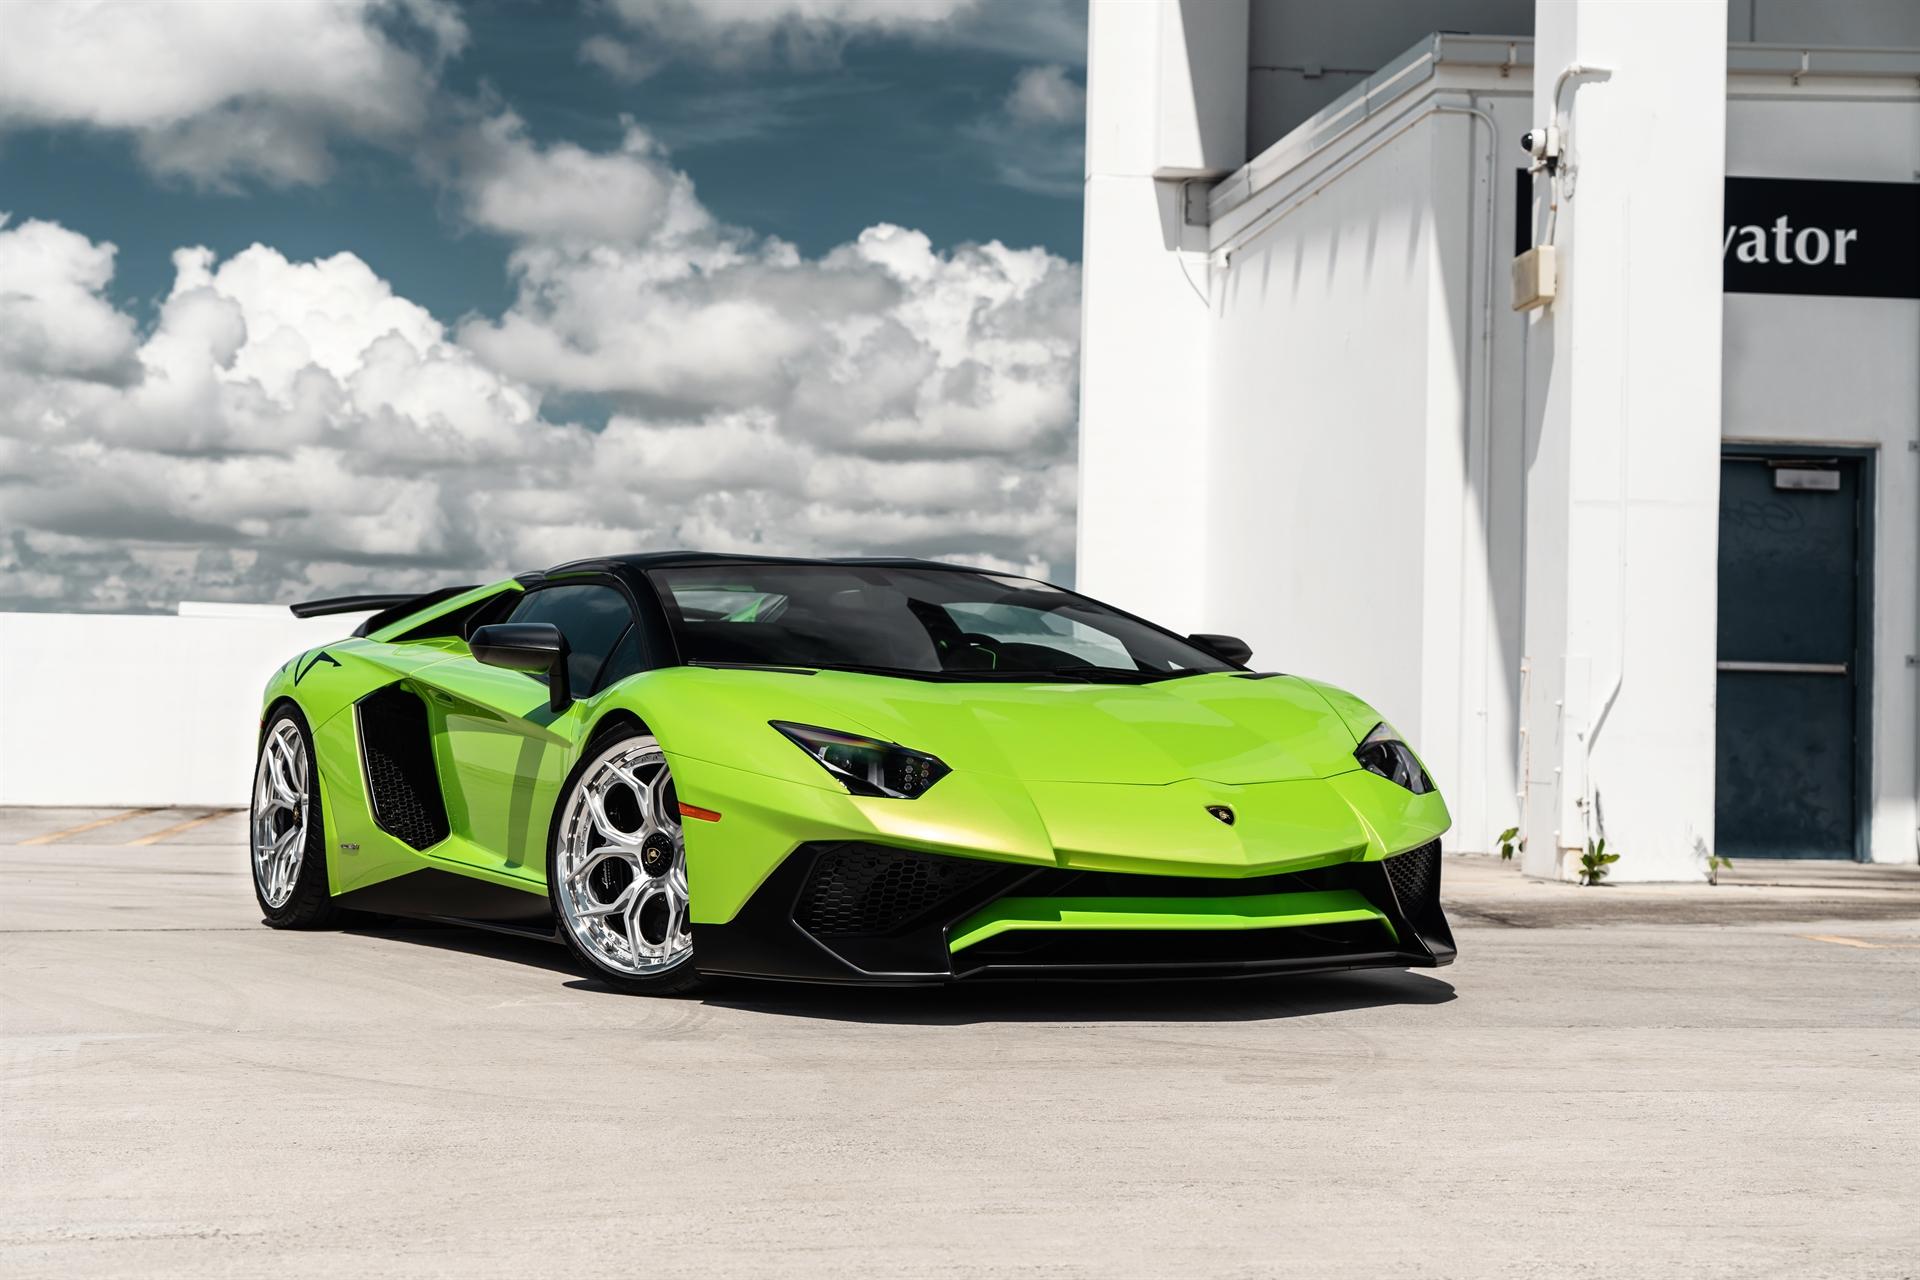 Lamborghini Aventador Sv Roadster On Hre S111sc Gallery Wheels Boutique